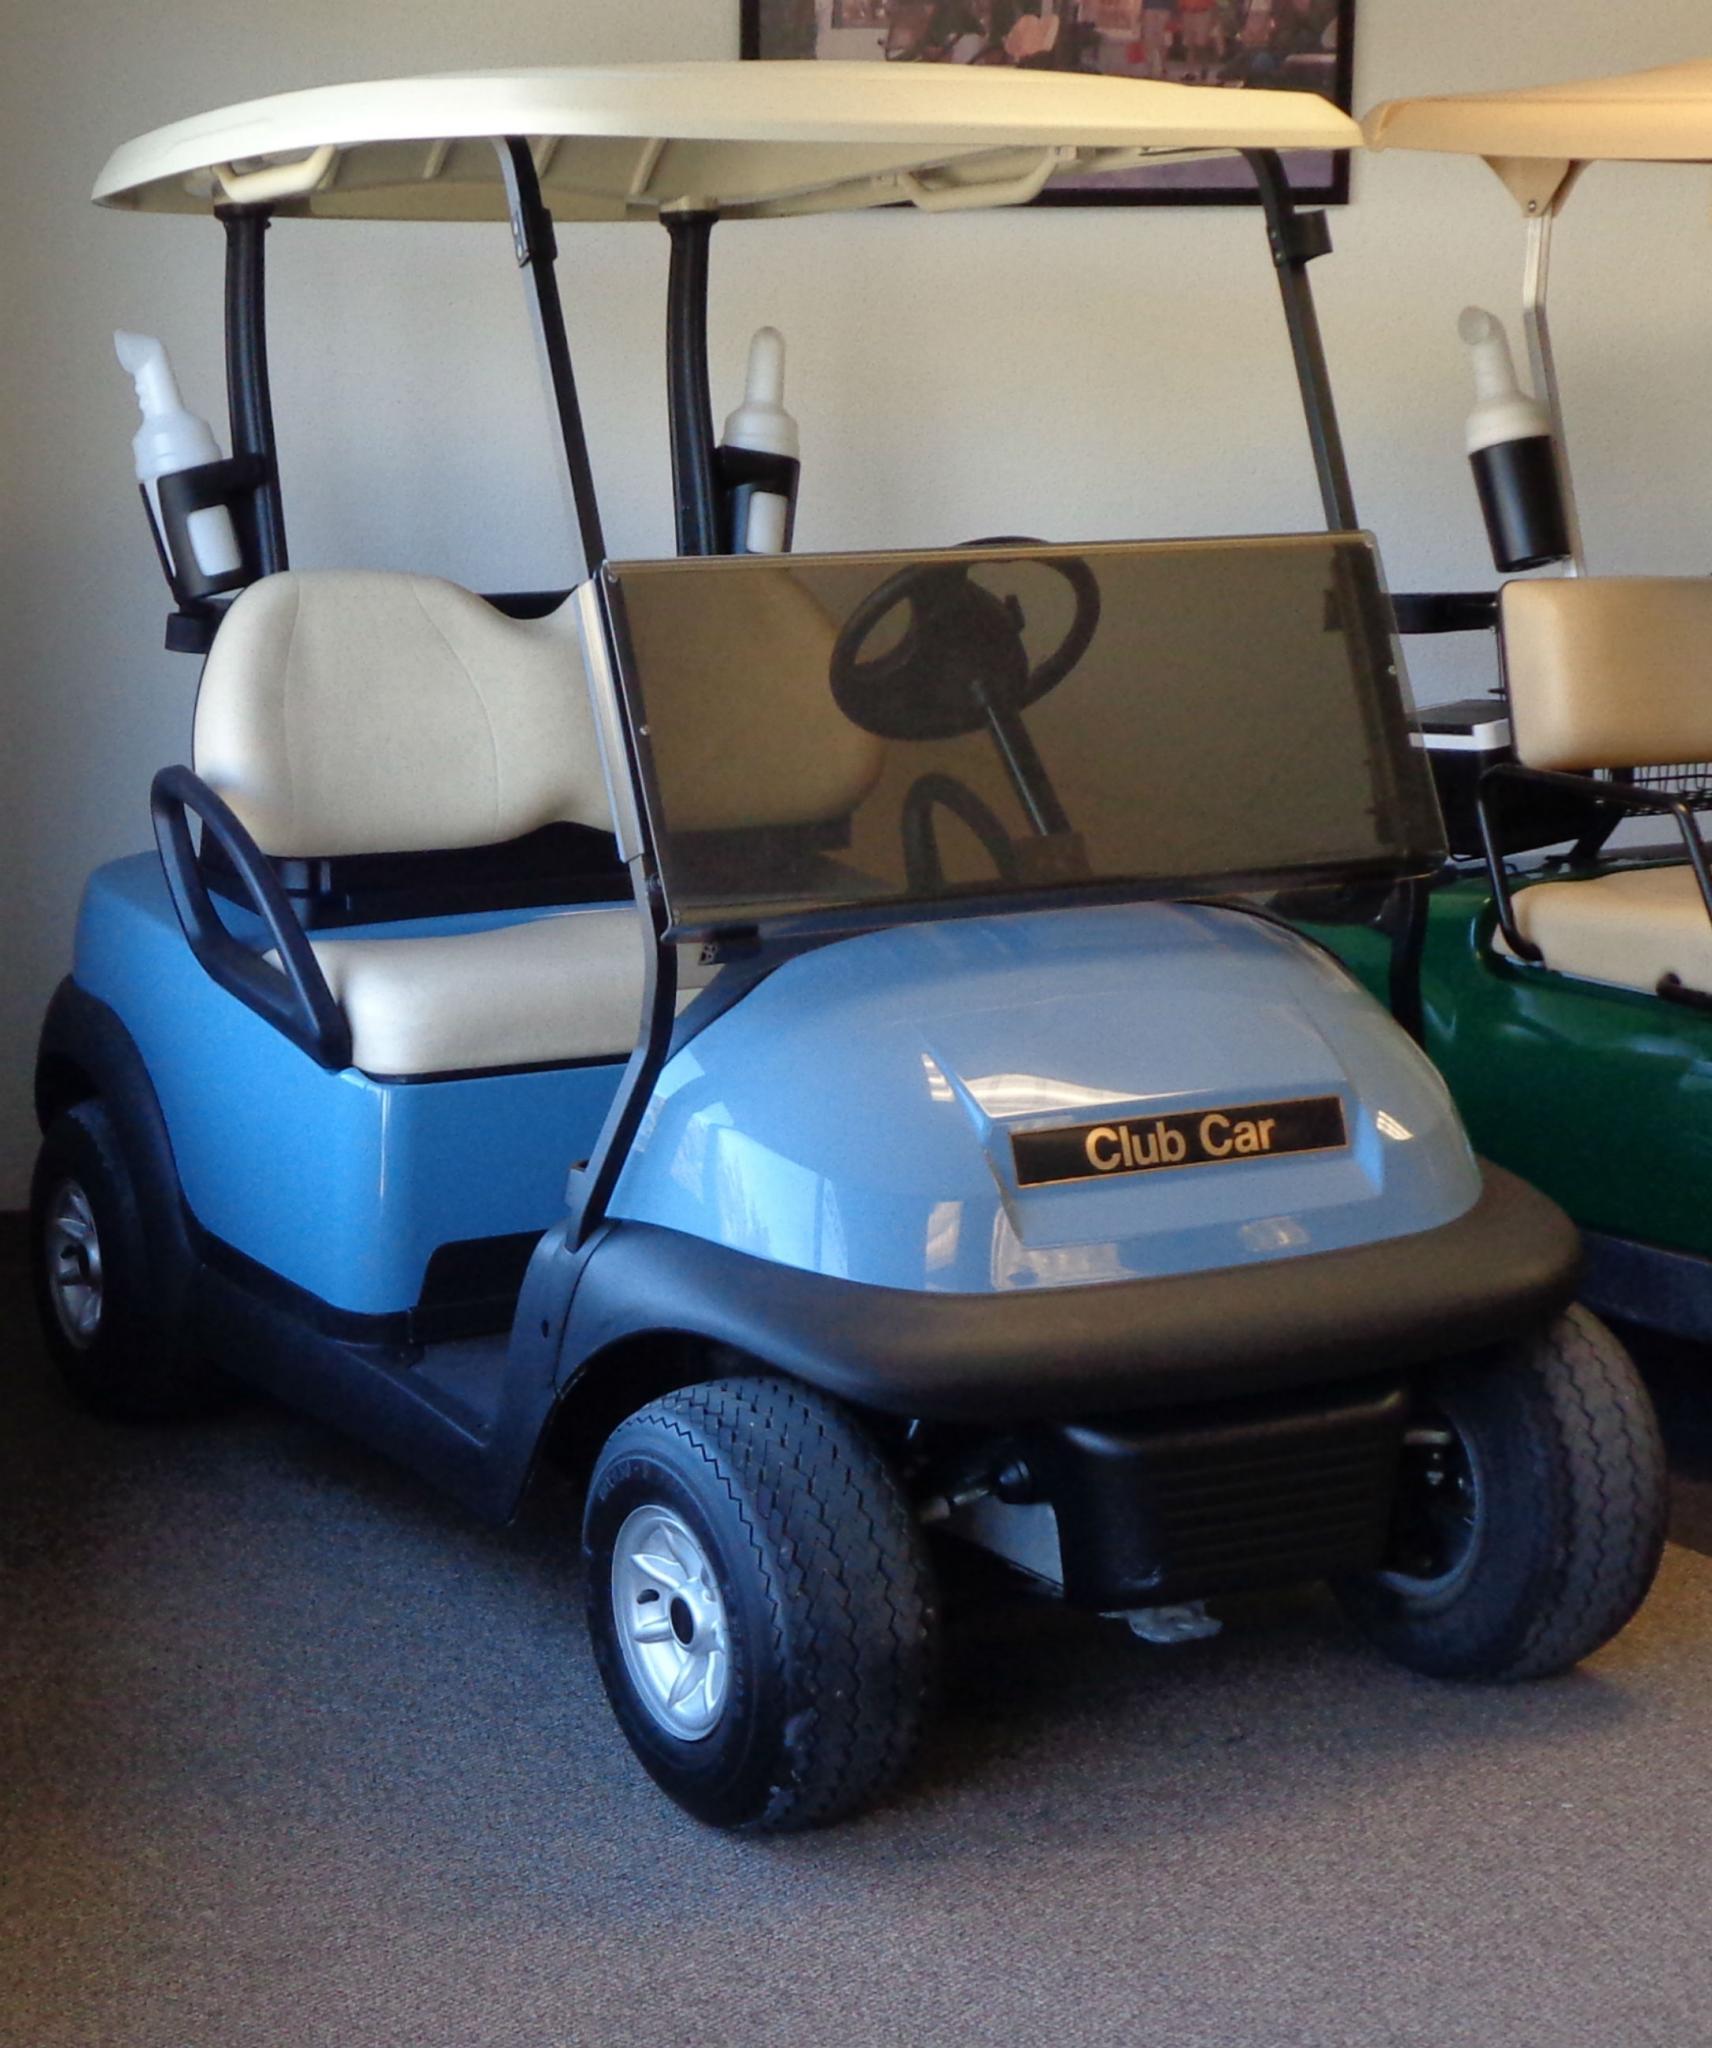 Stan's Golf Cars